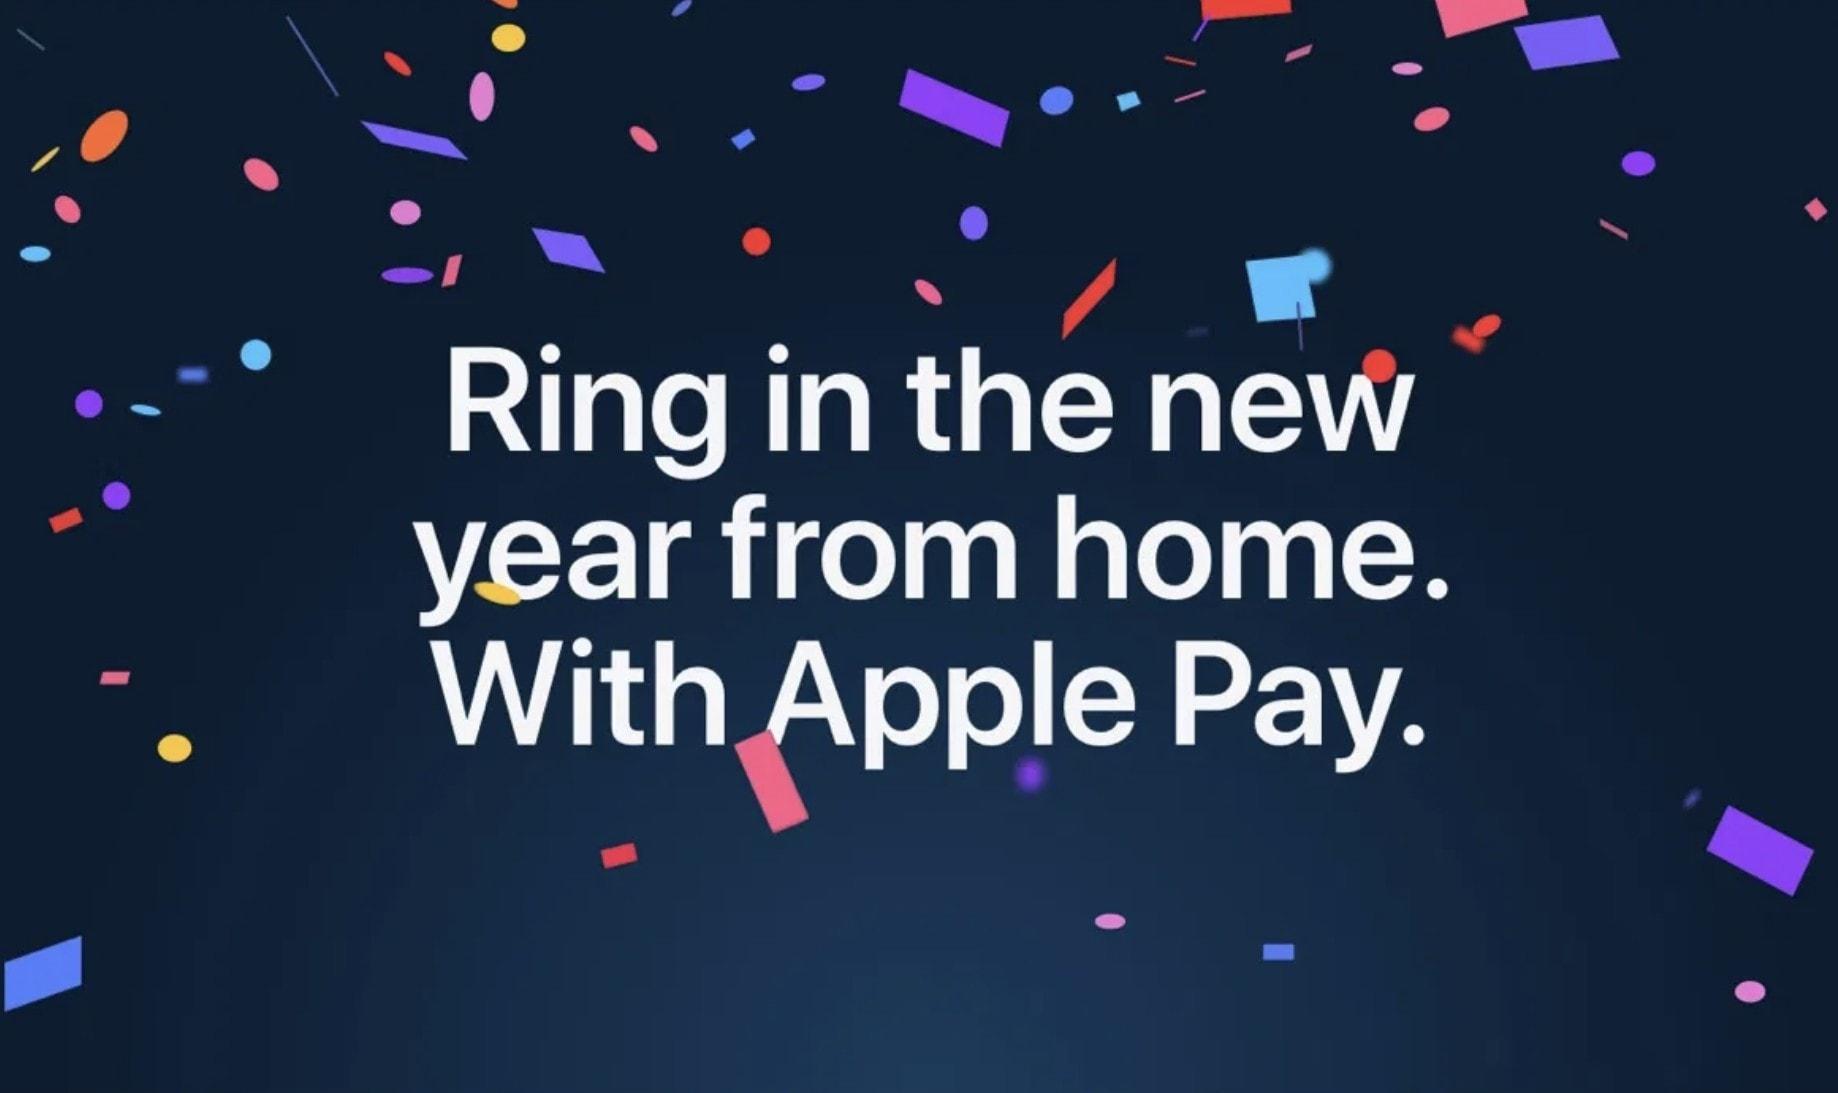 Latest Apple Pay offer grants 20% off Grubhub orders